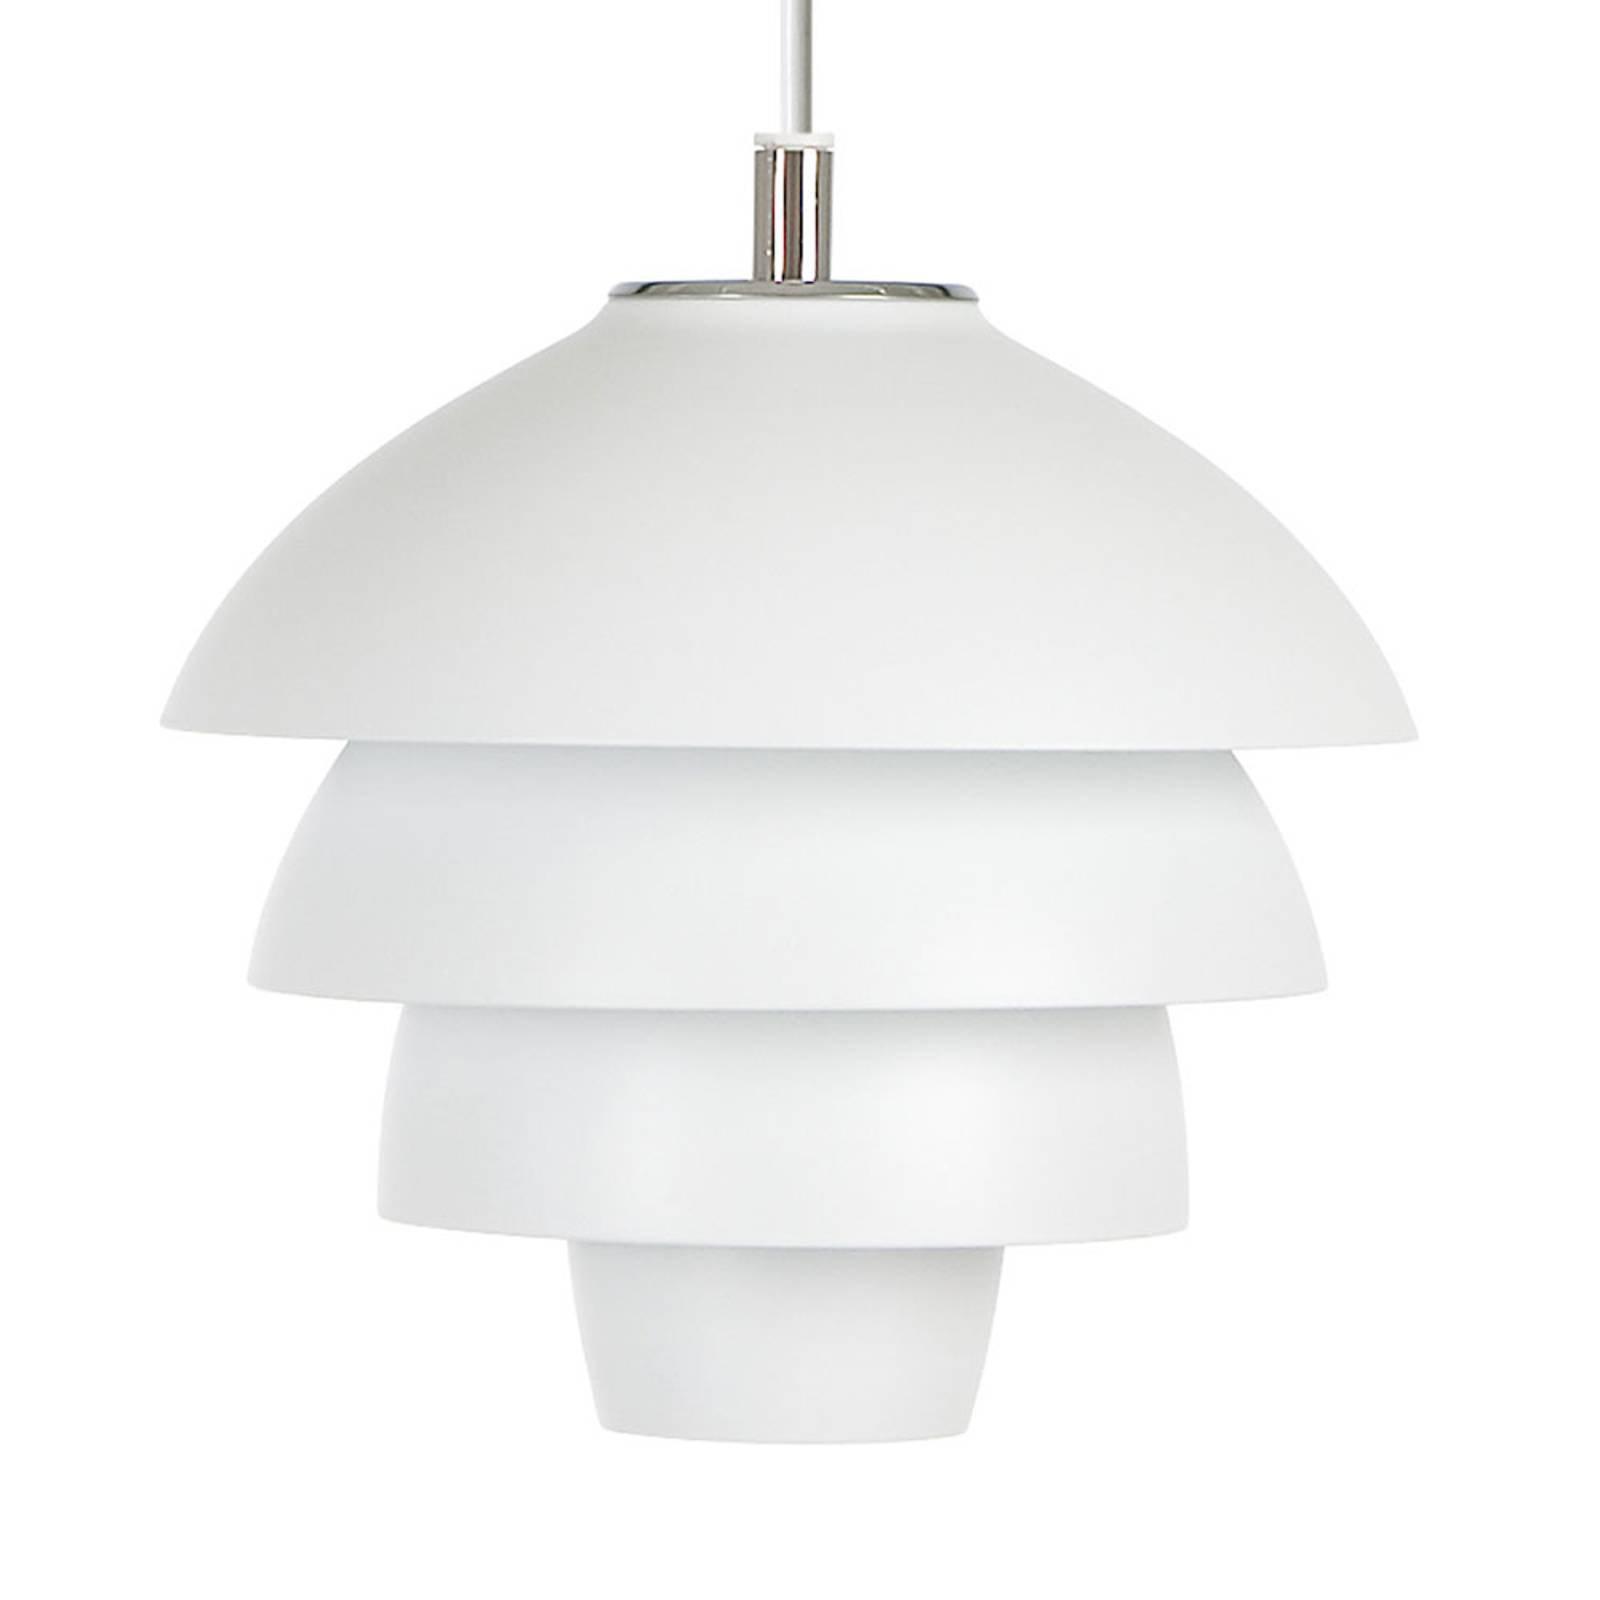 Hengelampe Valencia, Ø 18 cm, hvit, med plugg